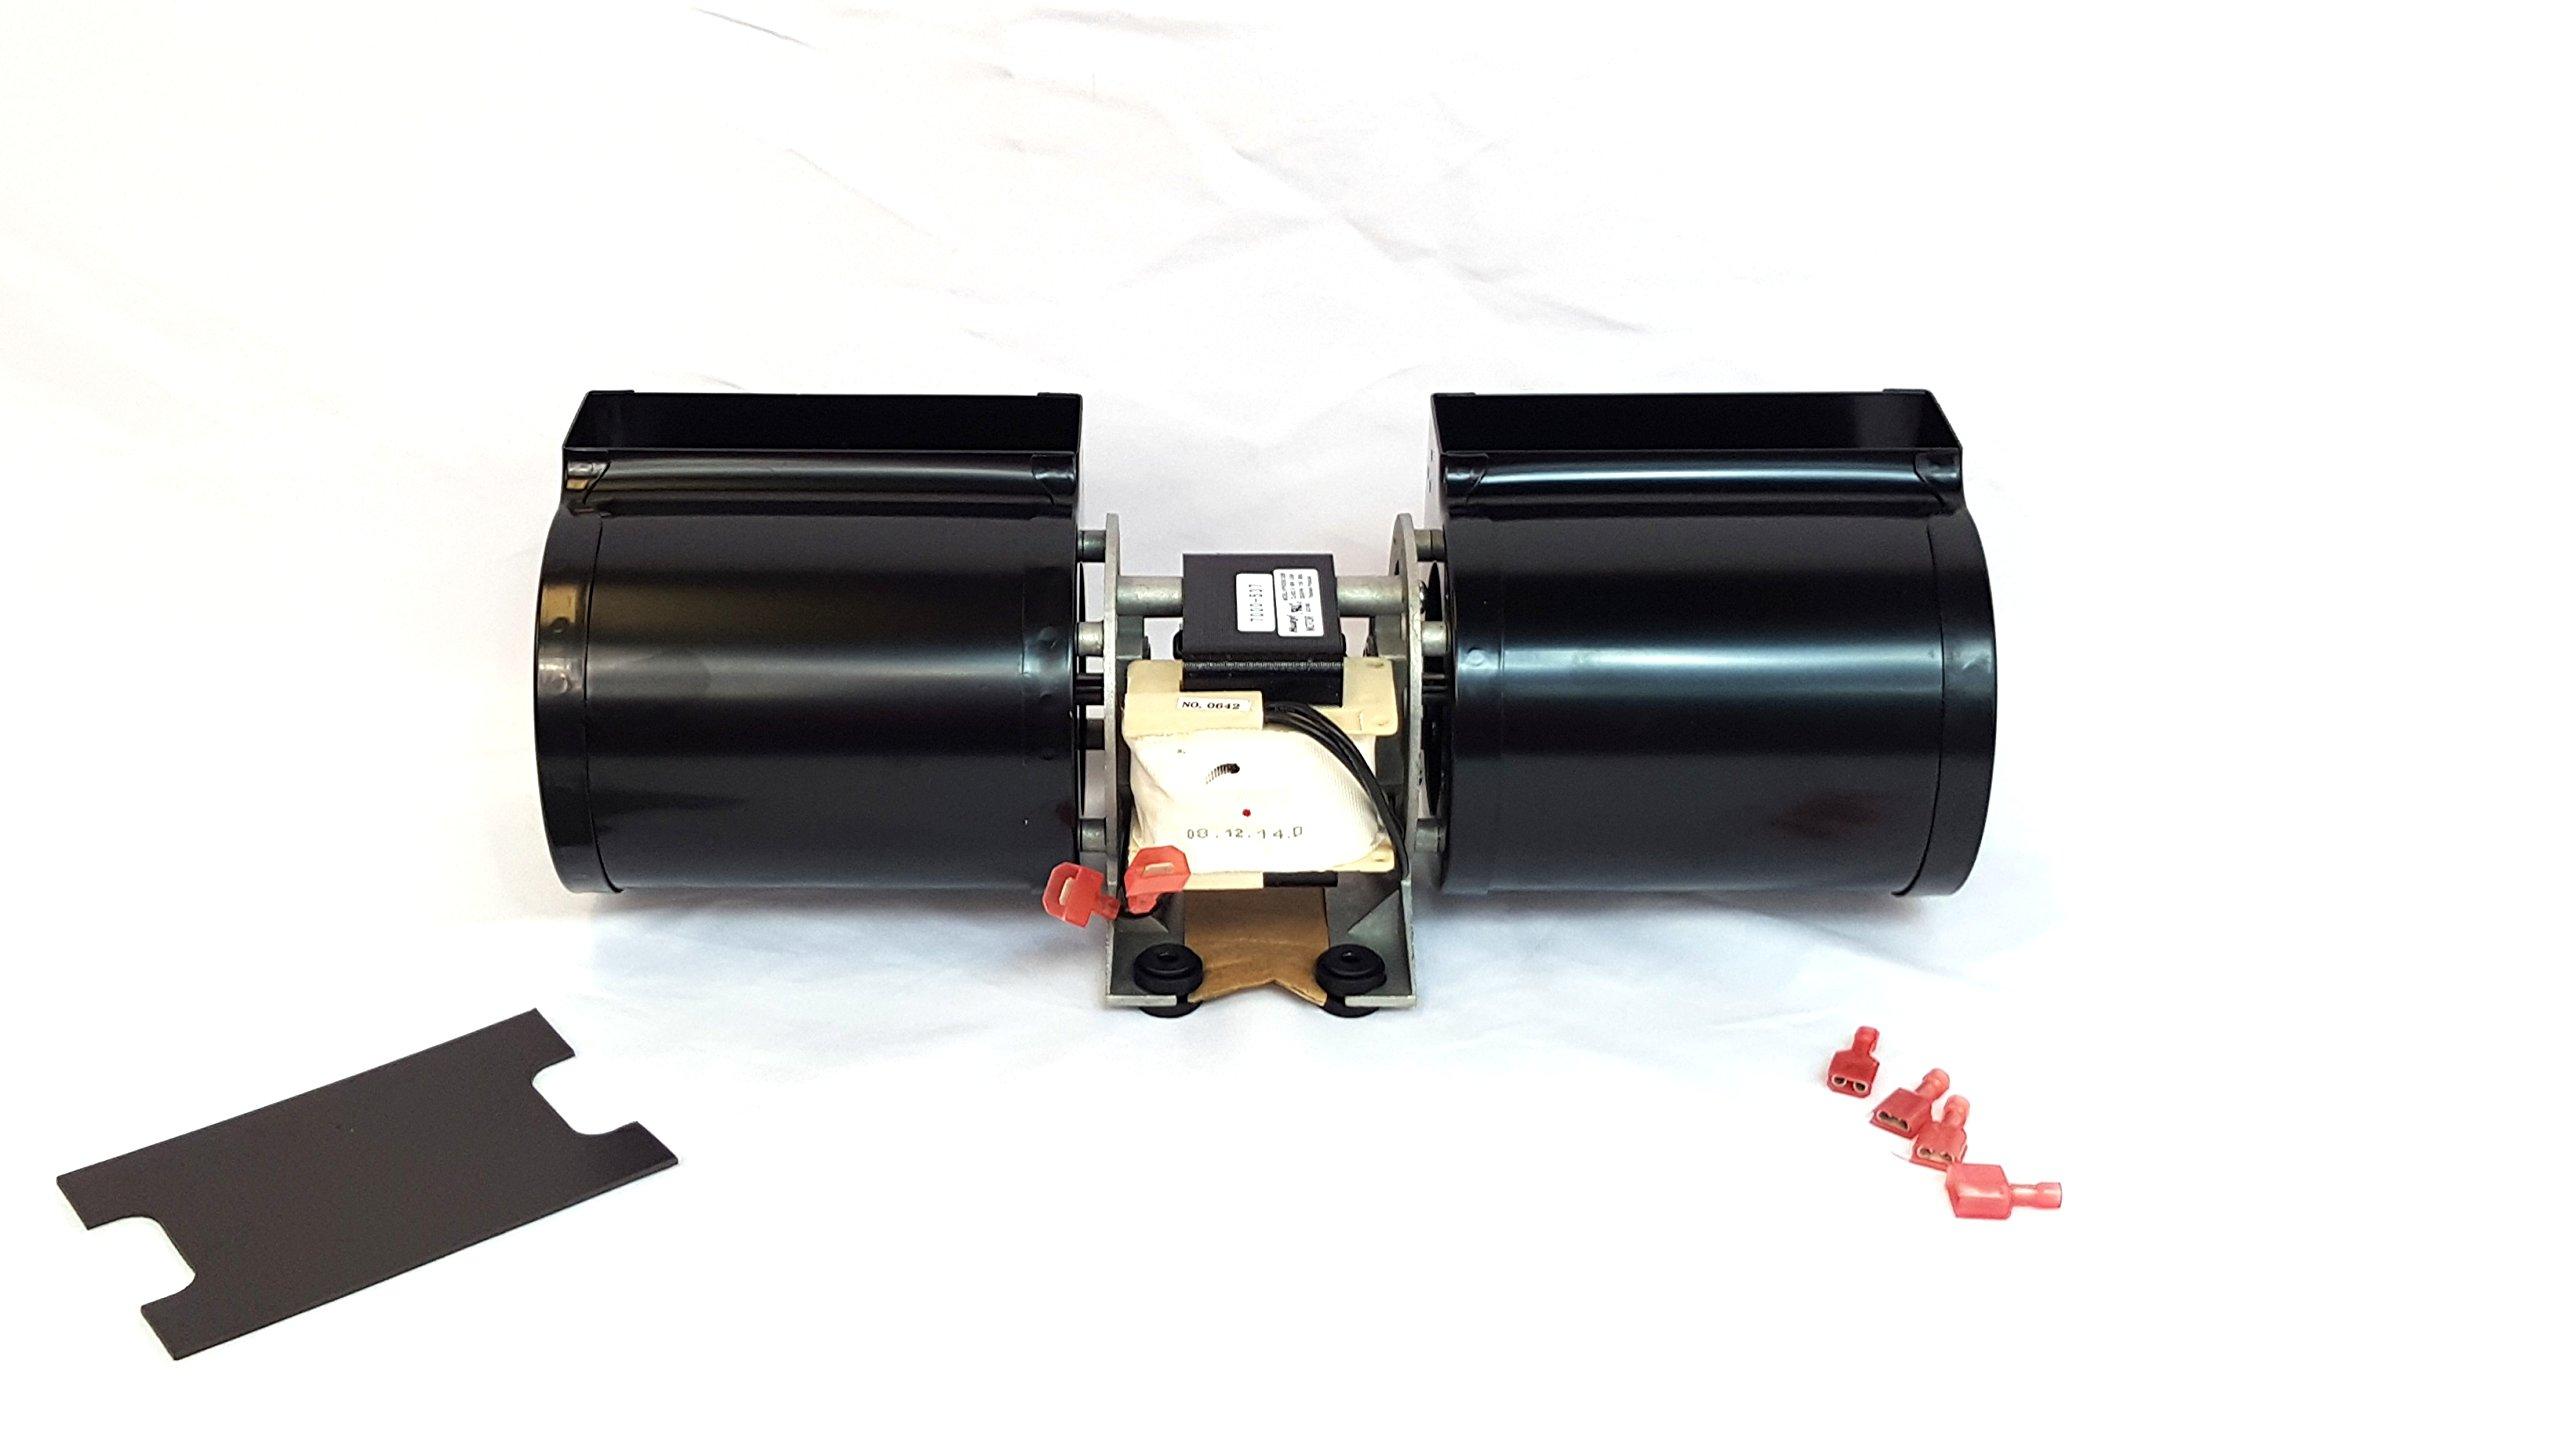 Quadrafire Stove Fan Room Air Blower Fan Pellet, Wood & Gas 812-4900 Premium Replacement,, SALE! by QuadraFire